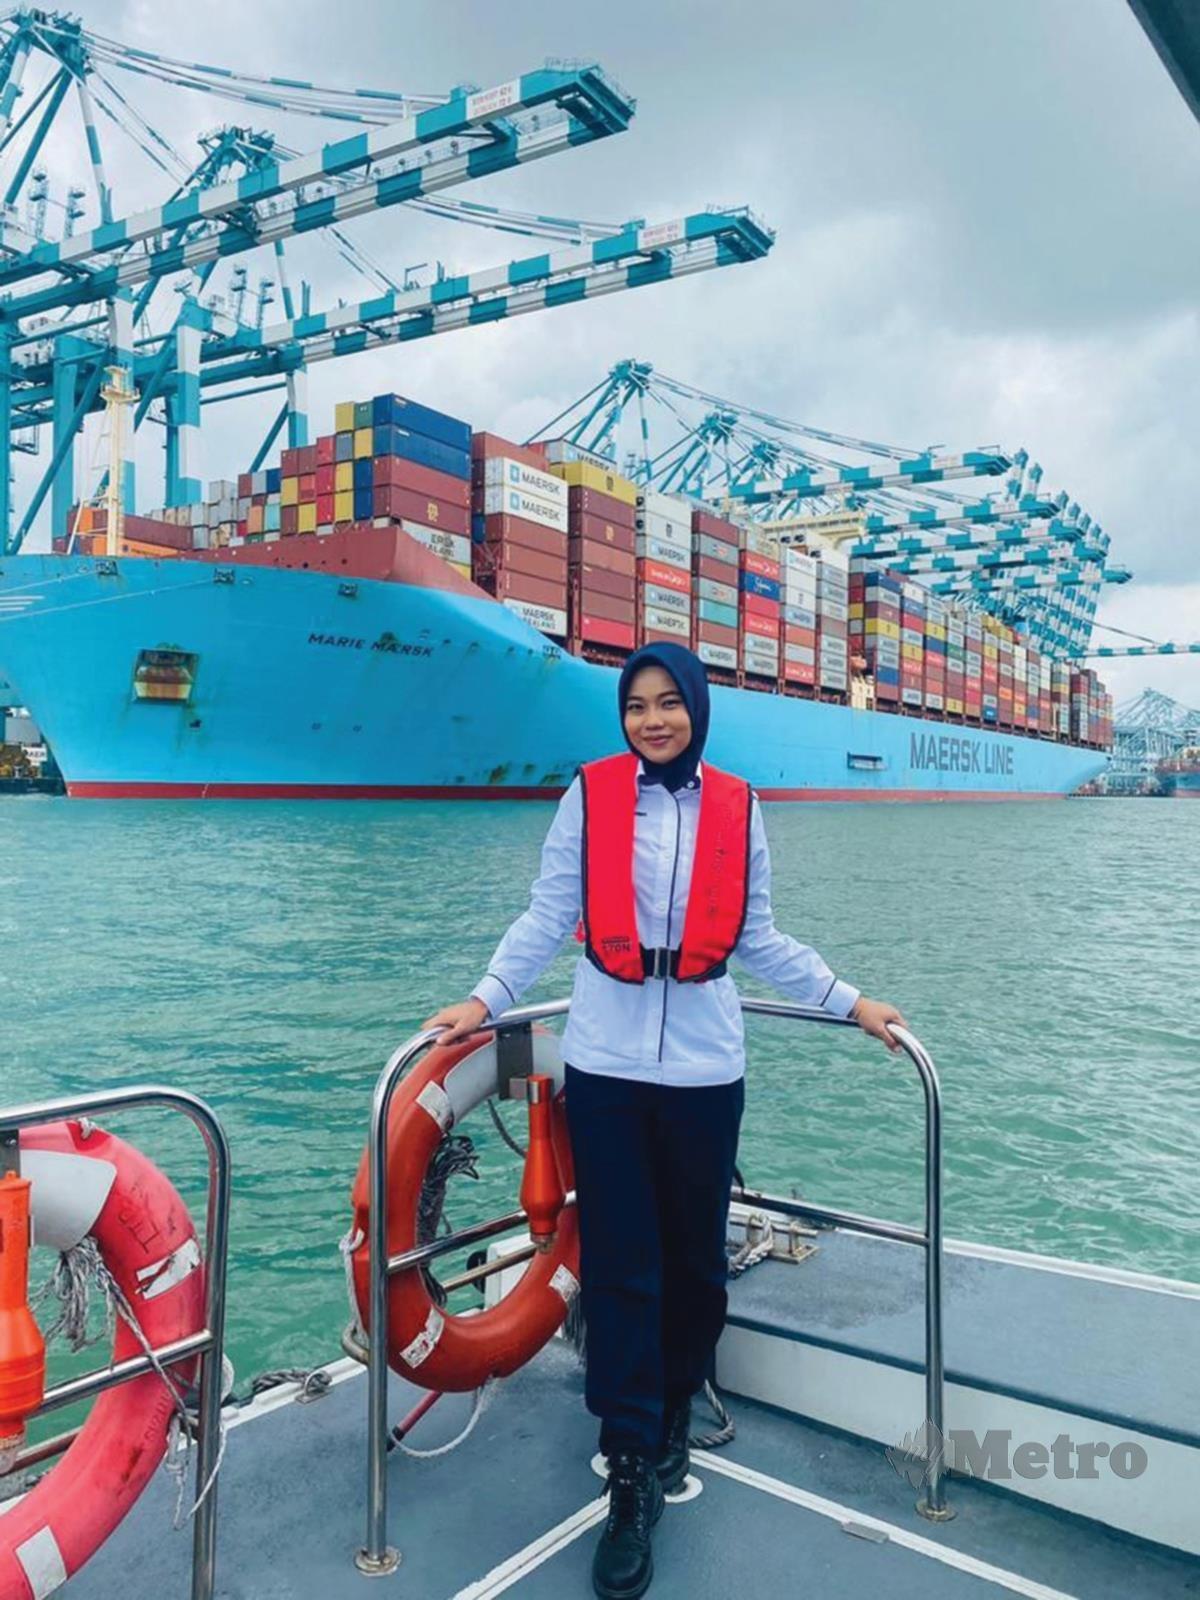 MALIM pelabuhan wanita pertama di Malaysia, Nurul Arrienne.